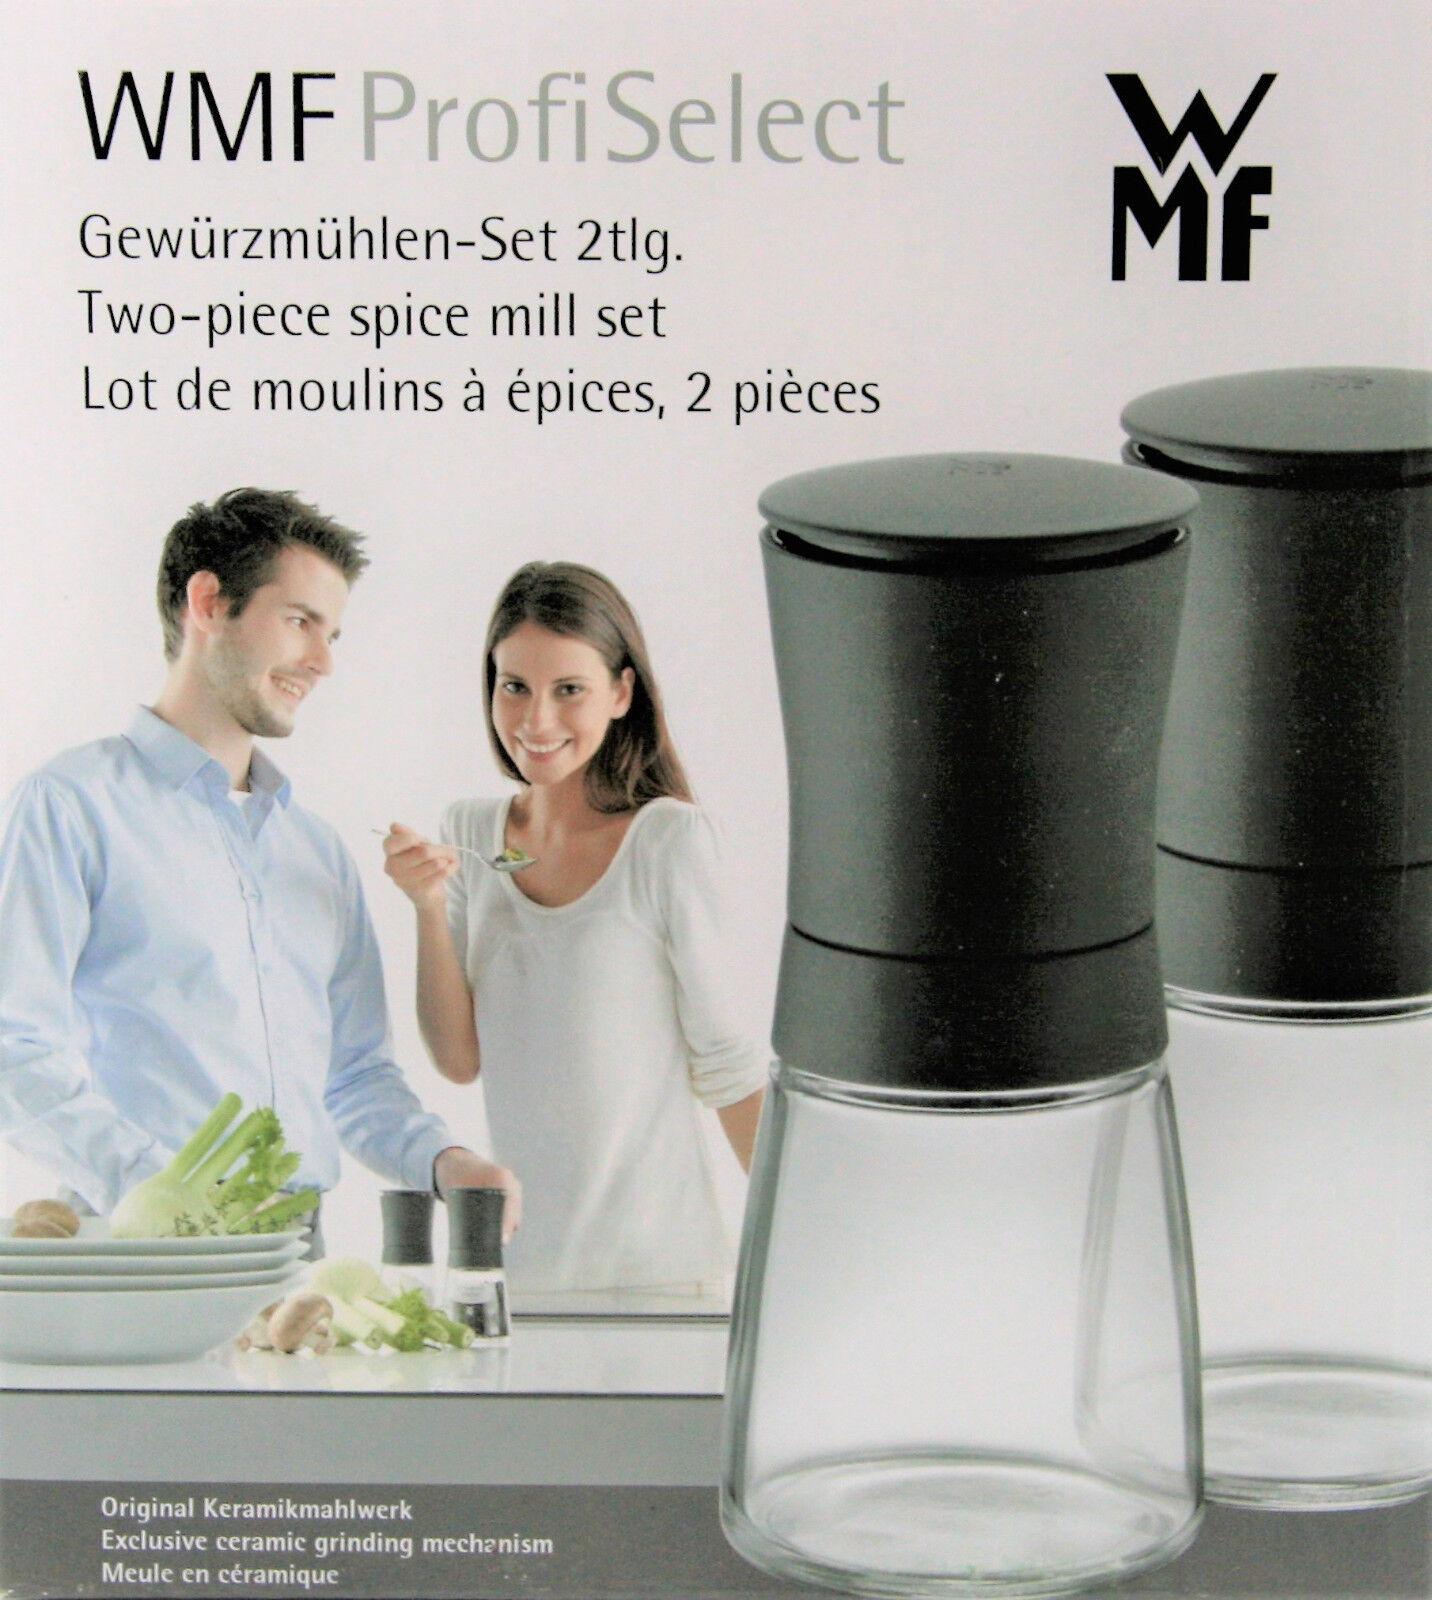 WMF 2 tlg.ProfiSelect Gewürzmühlen Set Salz-/Pfeffermühle Keramikmahlwerk